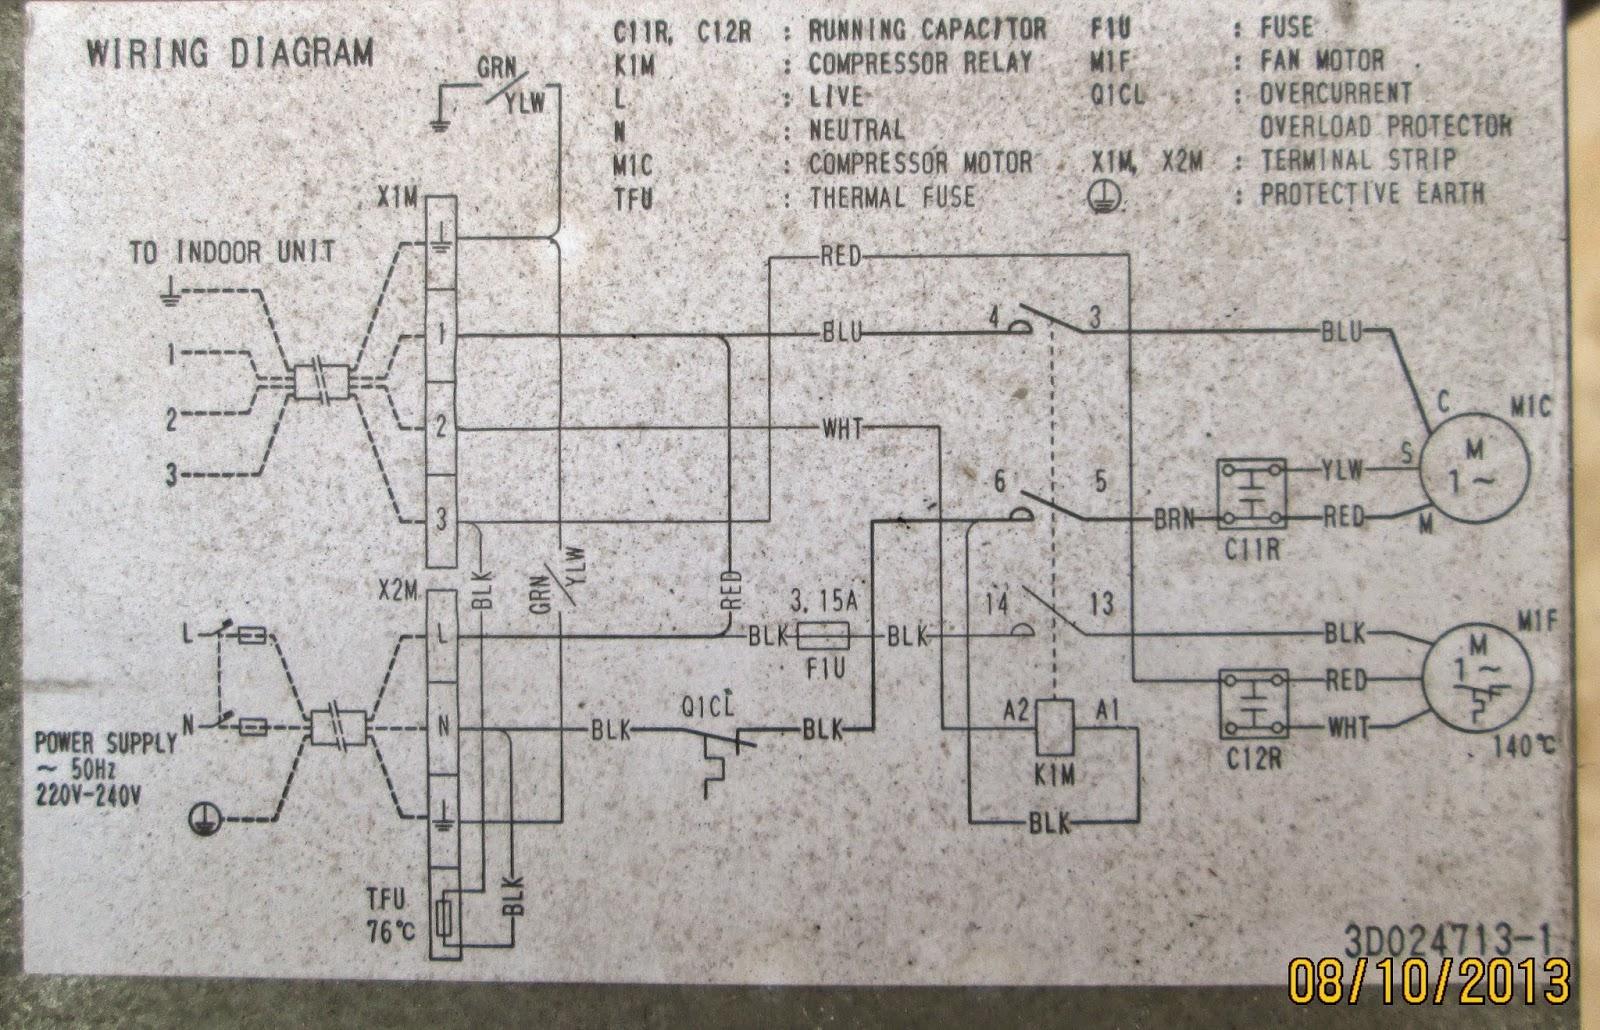 Daikin Split Ac 1 5 Ton Wiring Diagram 1000 Watt Inverter Circuit Service Kota Serang Baru Kelistrikan